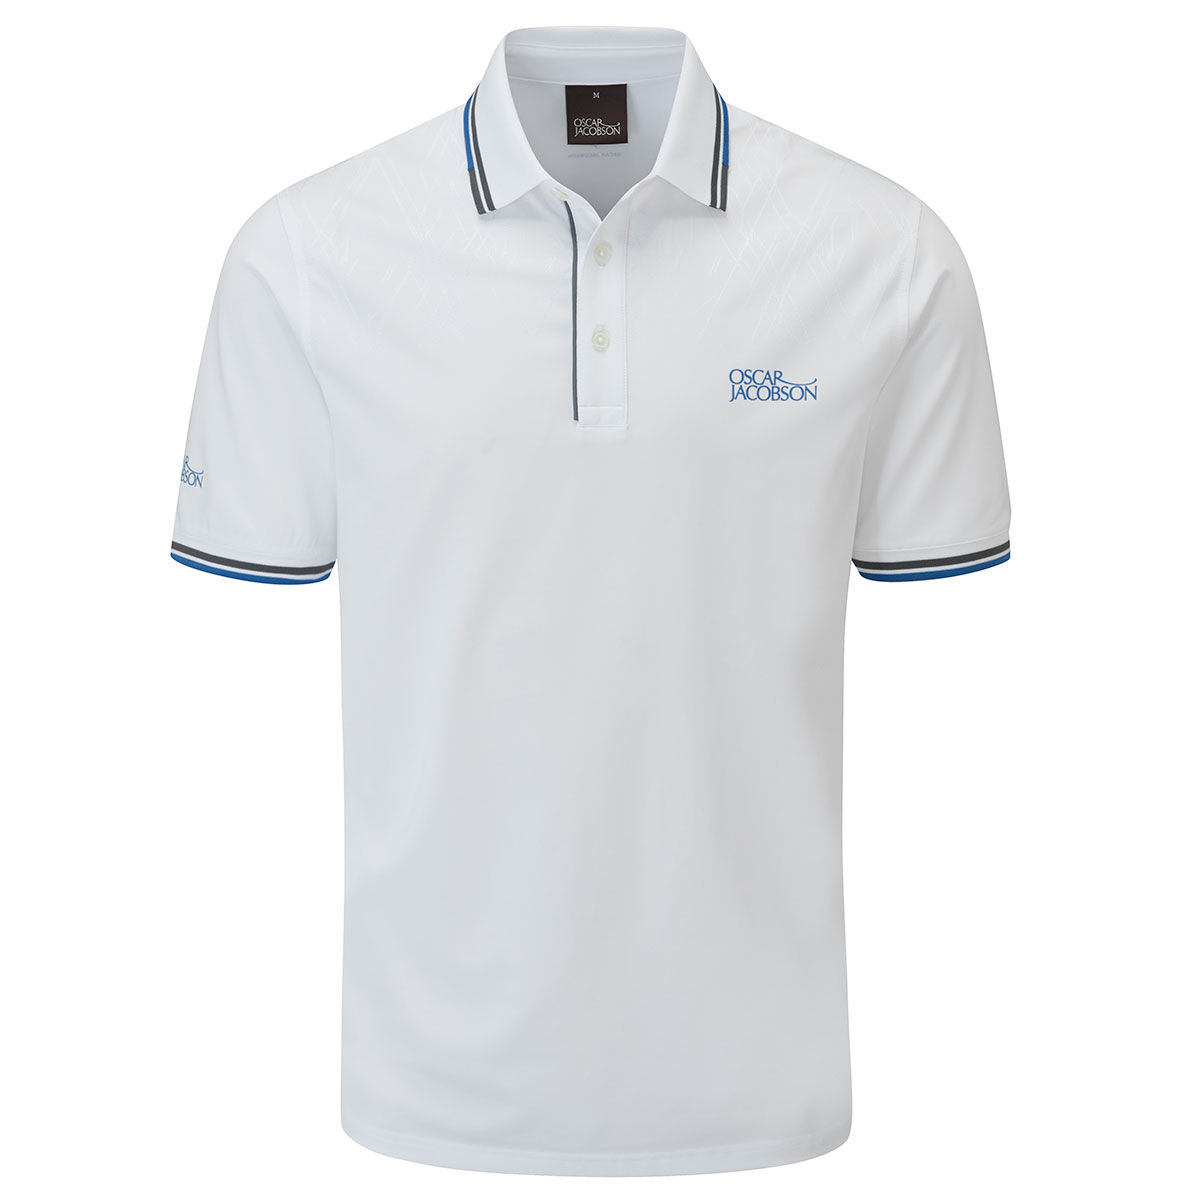 Oscar Jacobson Buxton Golf Polo Shirt, Mens, White, Large | American Golf